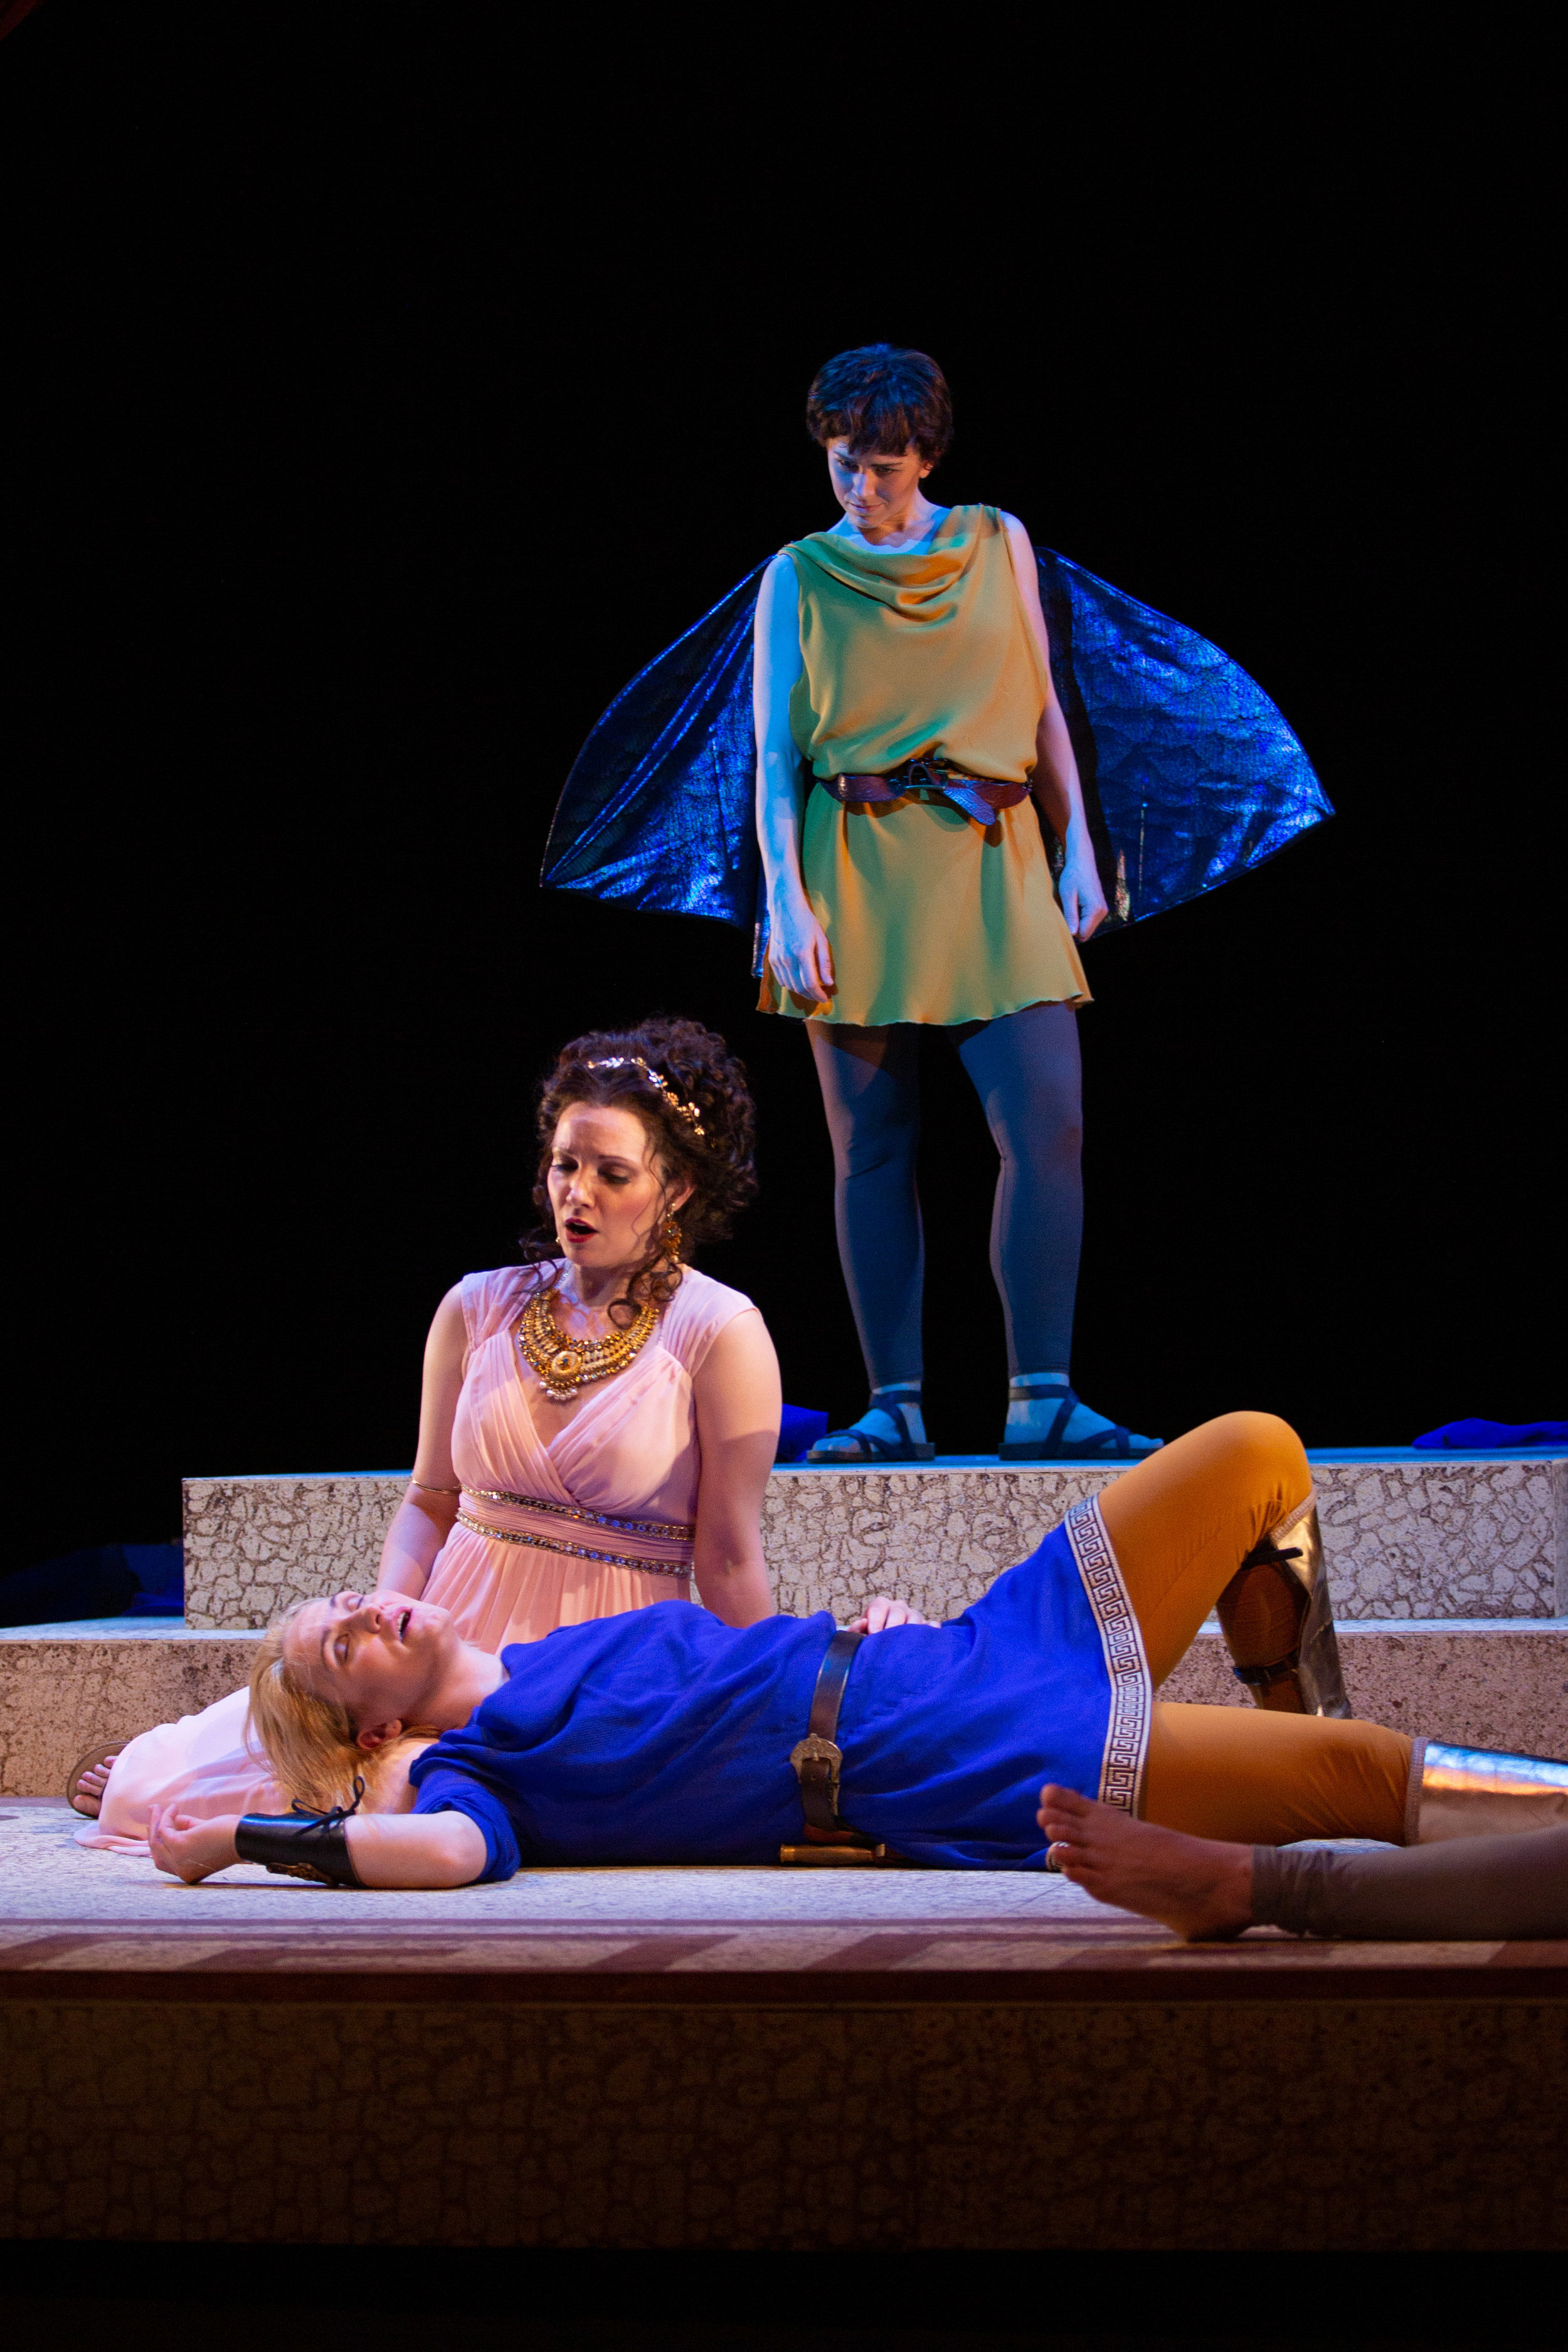 "Erica Schuller as Cupid, Mireille Asselin as Elena, and Meghan Lindsay as Paride in Odyssey Opera's ""Paride ed Elena."" Kathy Wittman photograph"